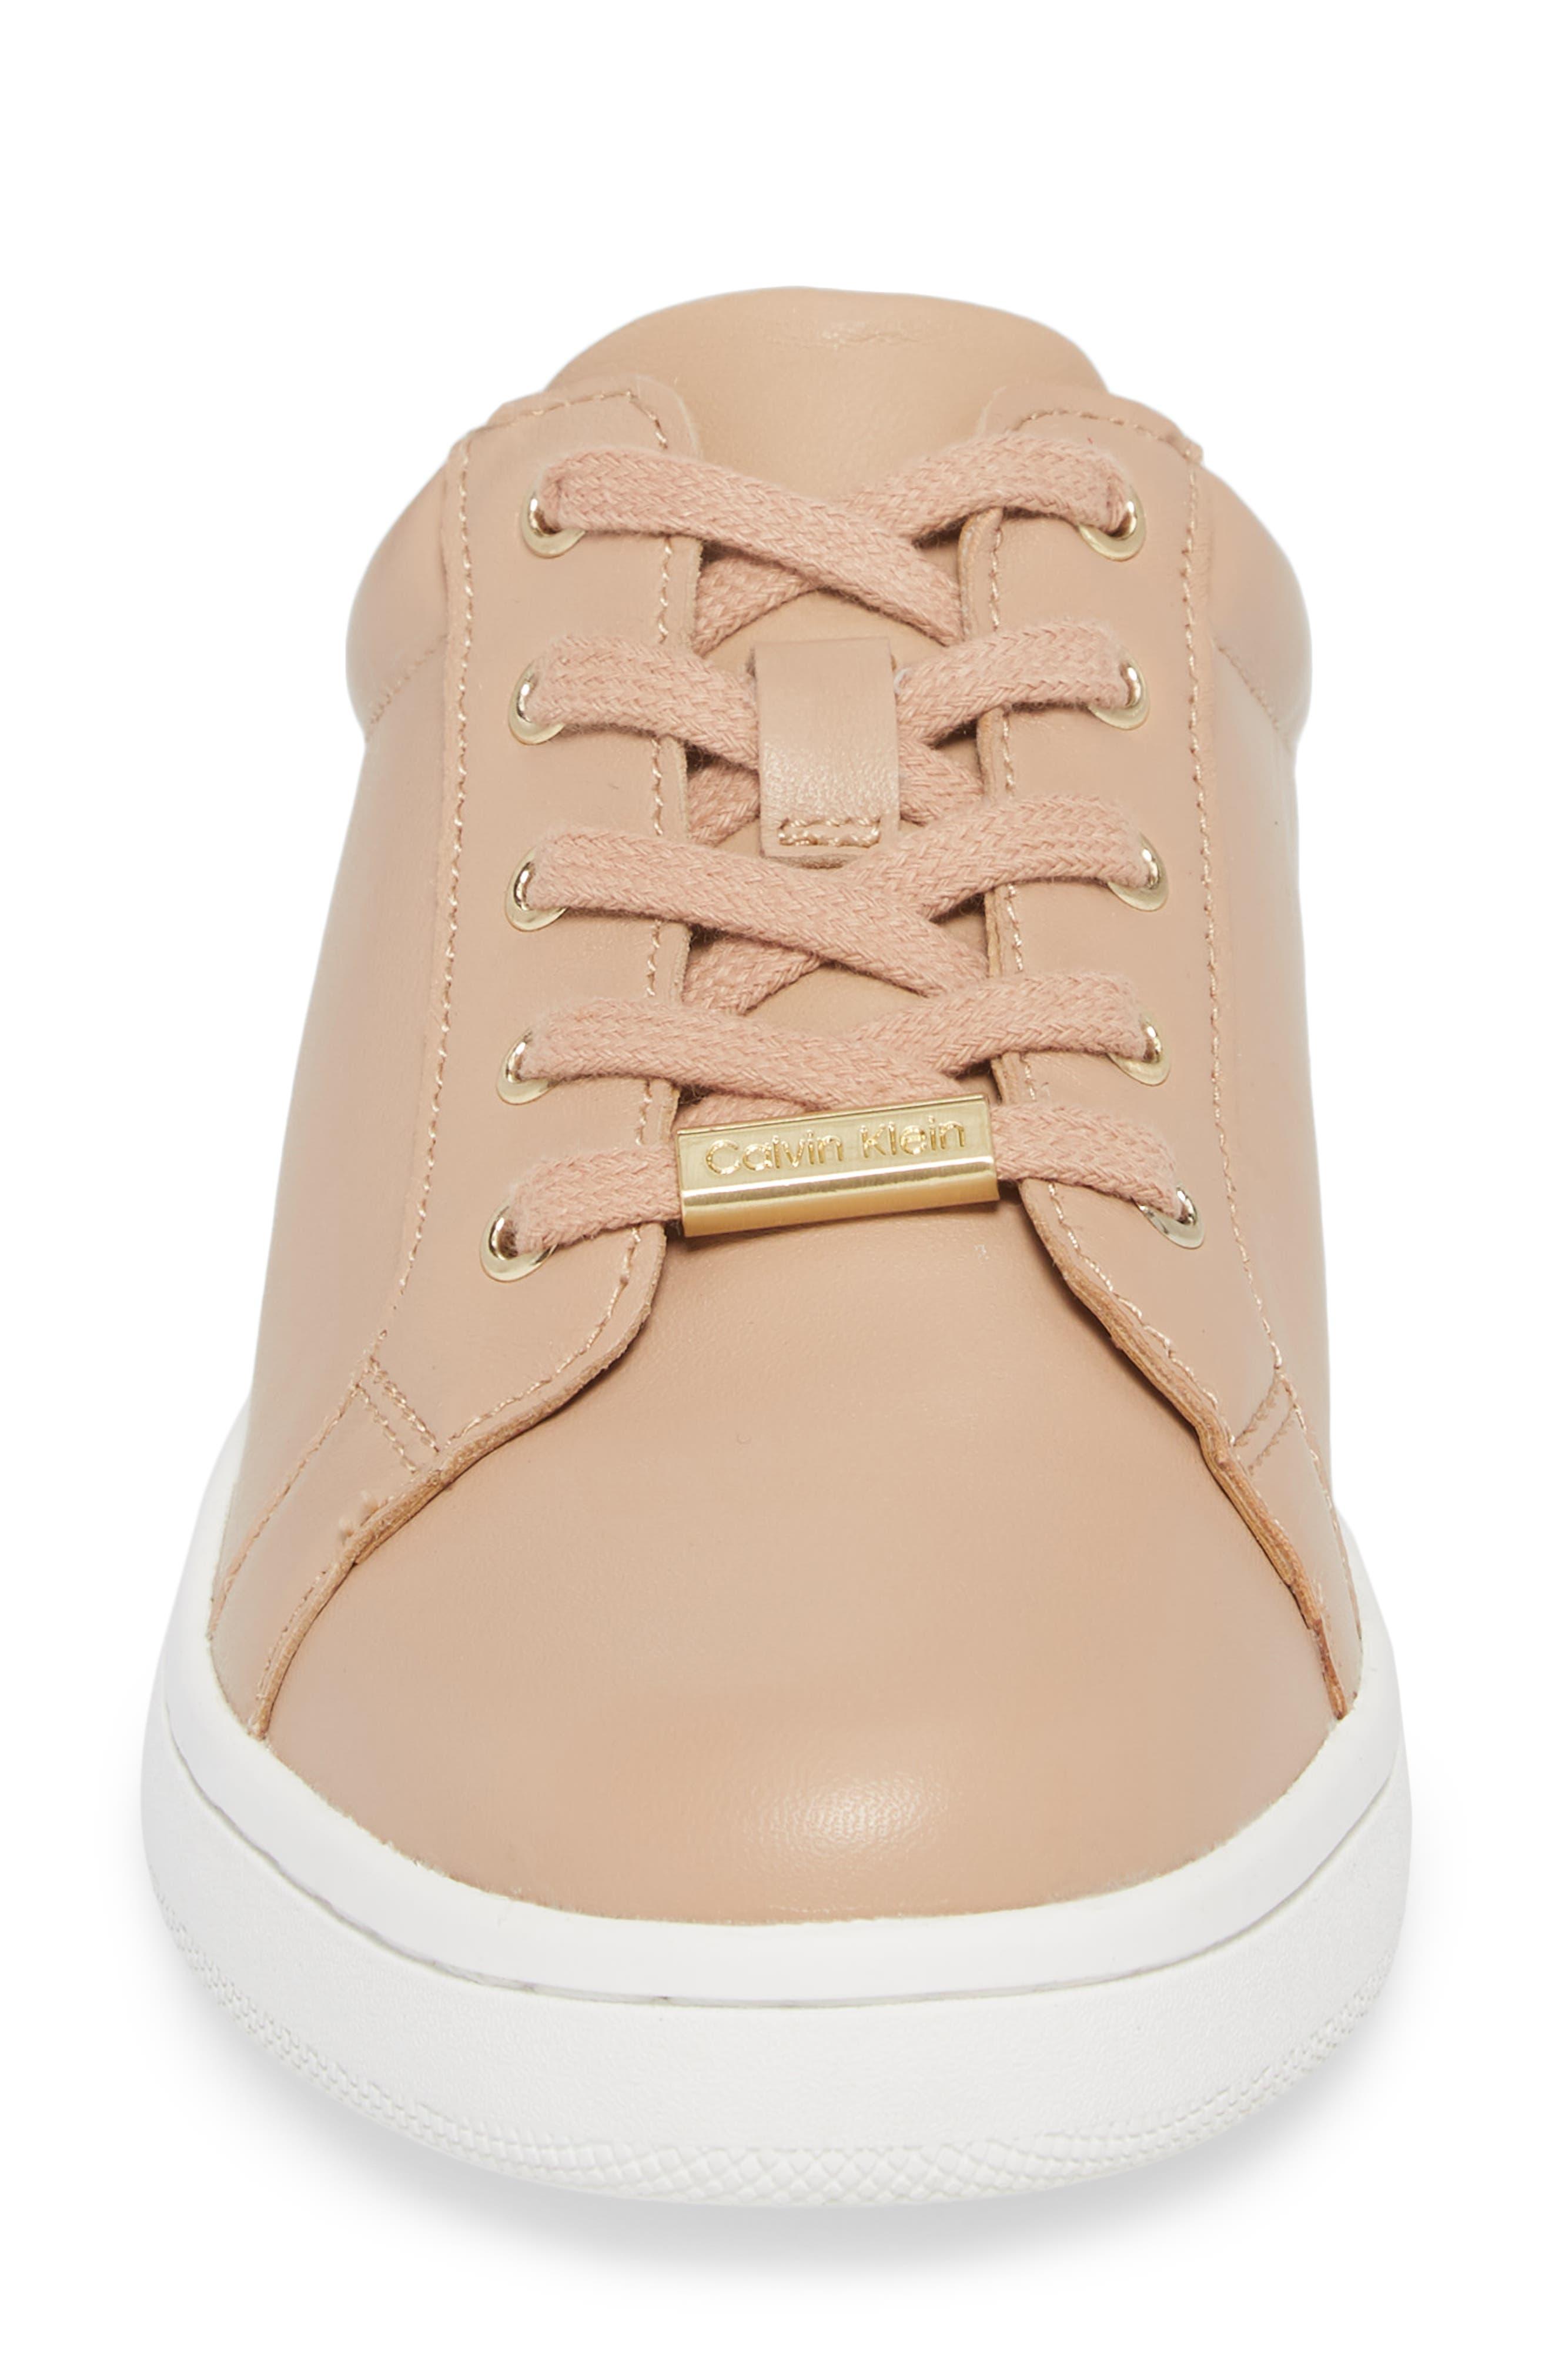 Danica Convertible Sneaker,                             Alternate thumbnail 5, color,                             Desert Sand Leather